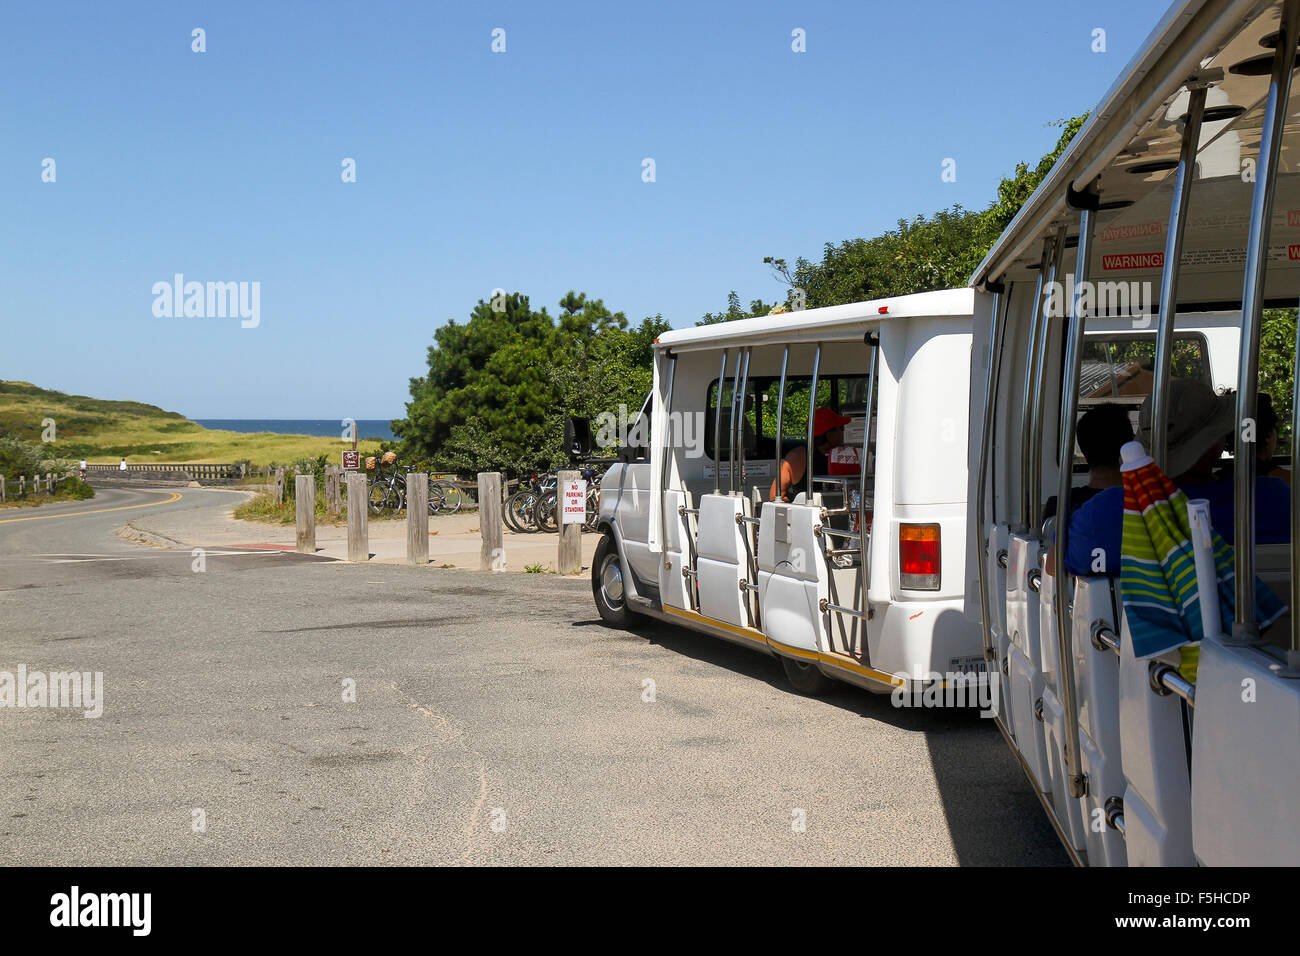 Tram for visitors at Coast Guard Beach, Cape Cod National Seashore, Eastham, Massachusetts - Stock Image